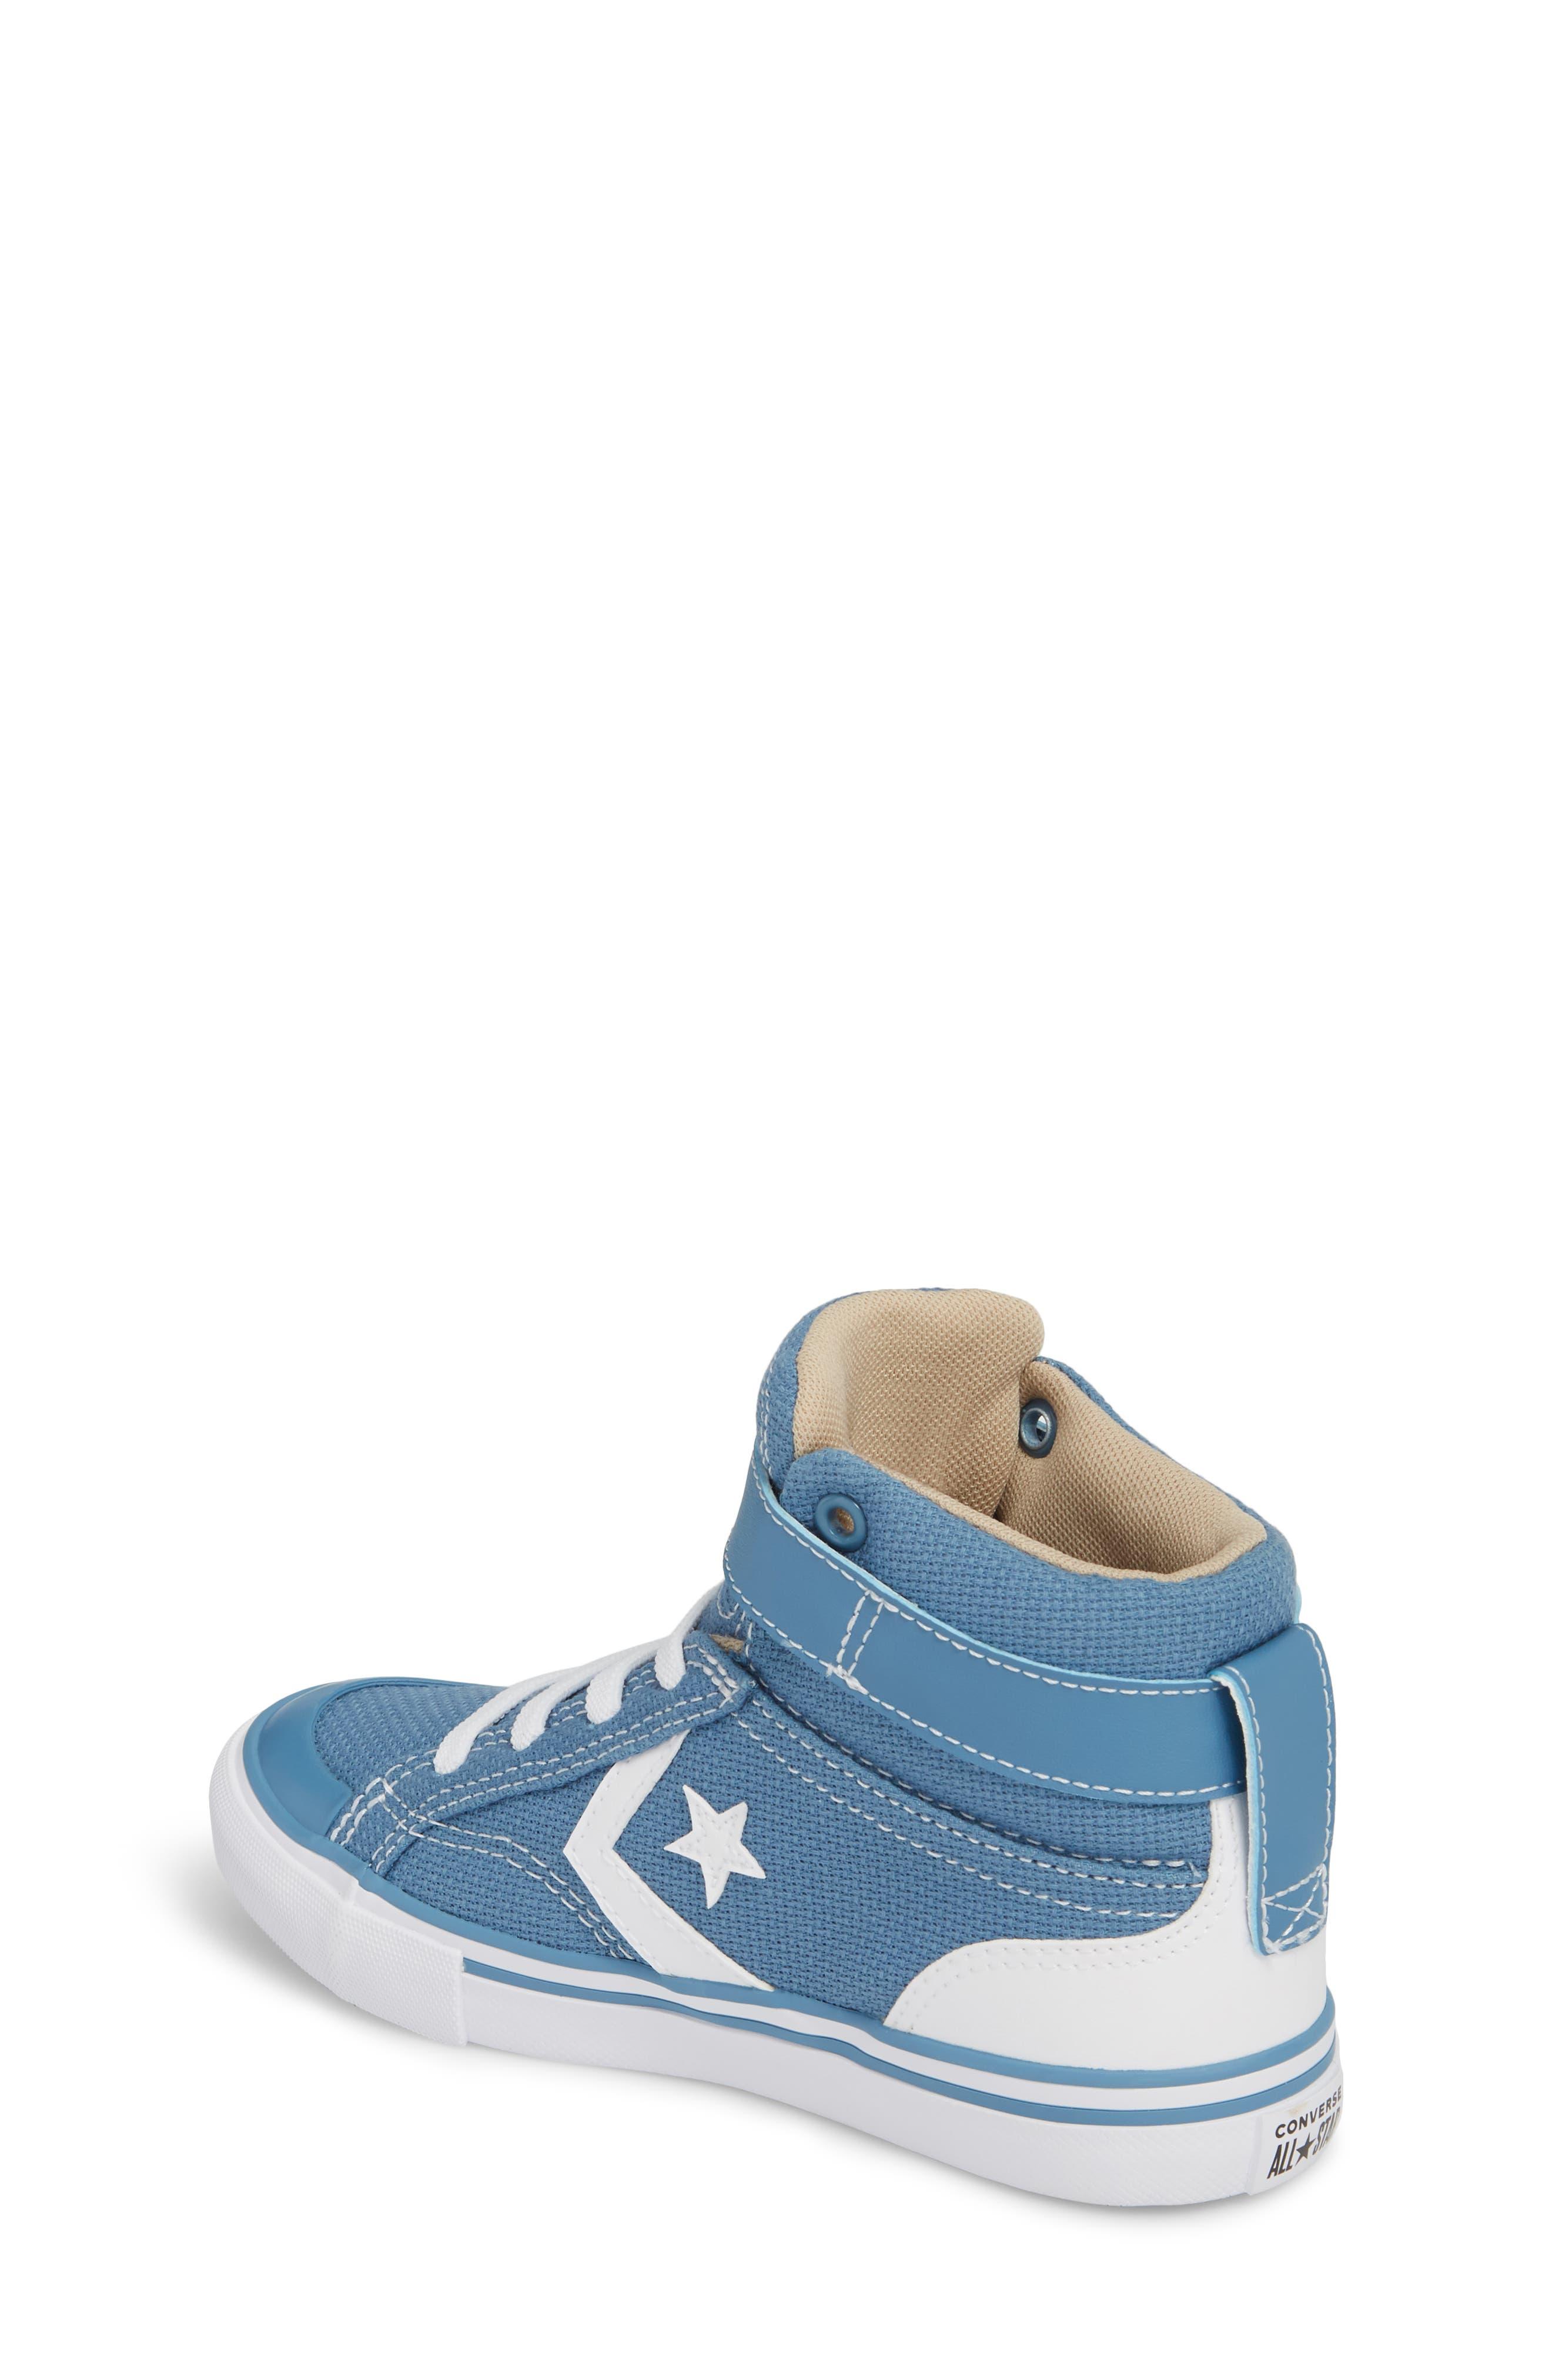 Alternate Image 2  - Converse Pro Blaze High Top Sneaker (Toddler, Little Kid & Big Kid)